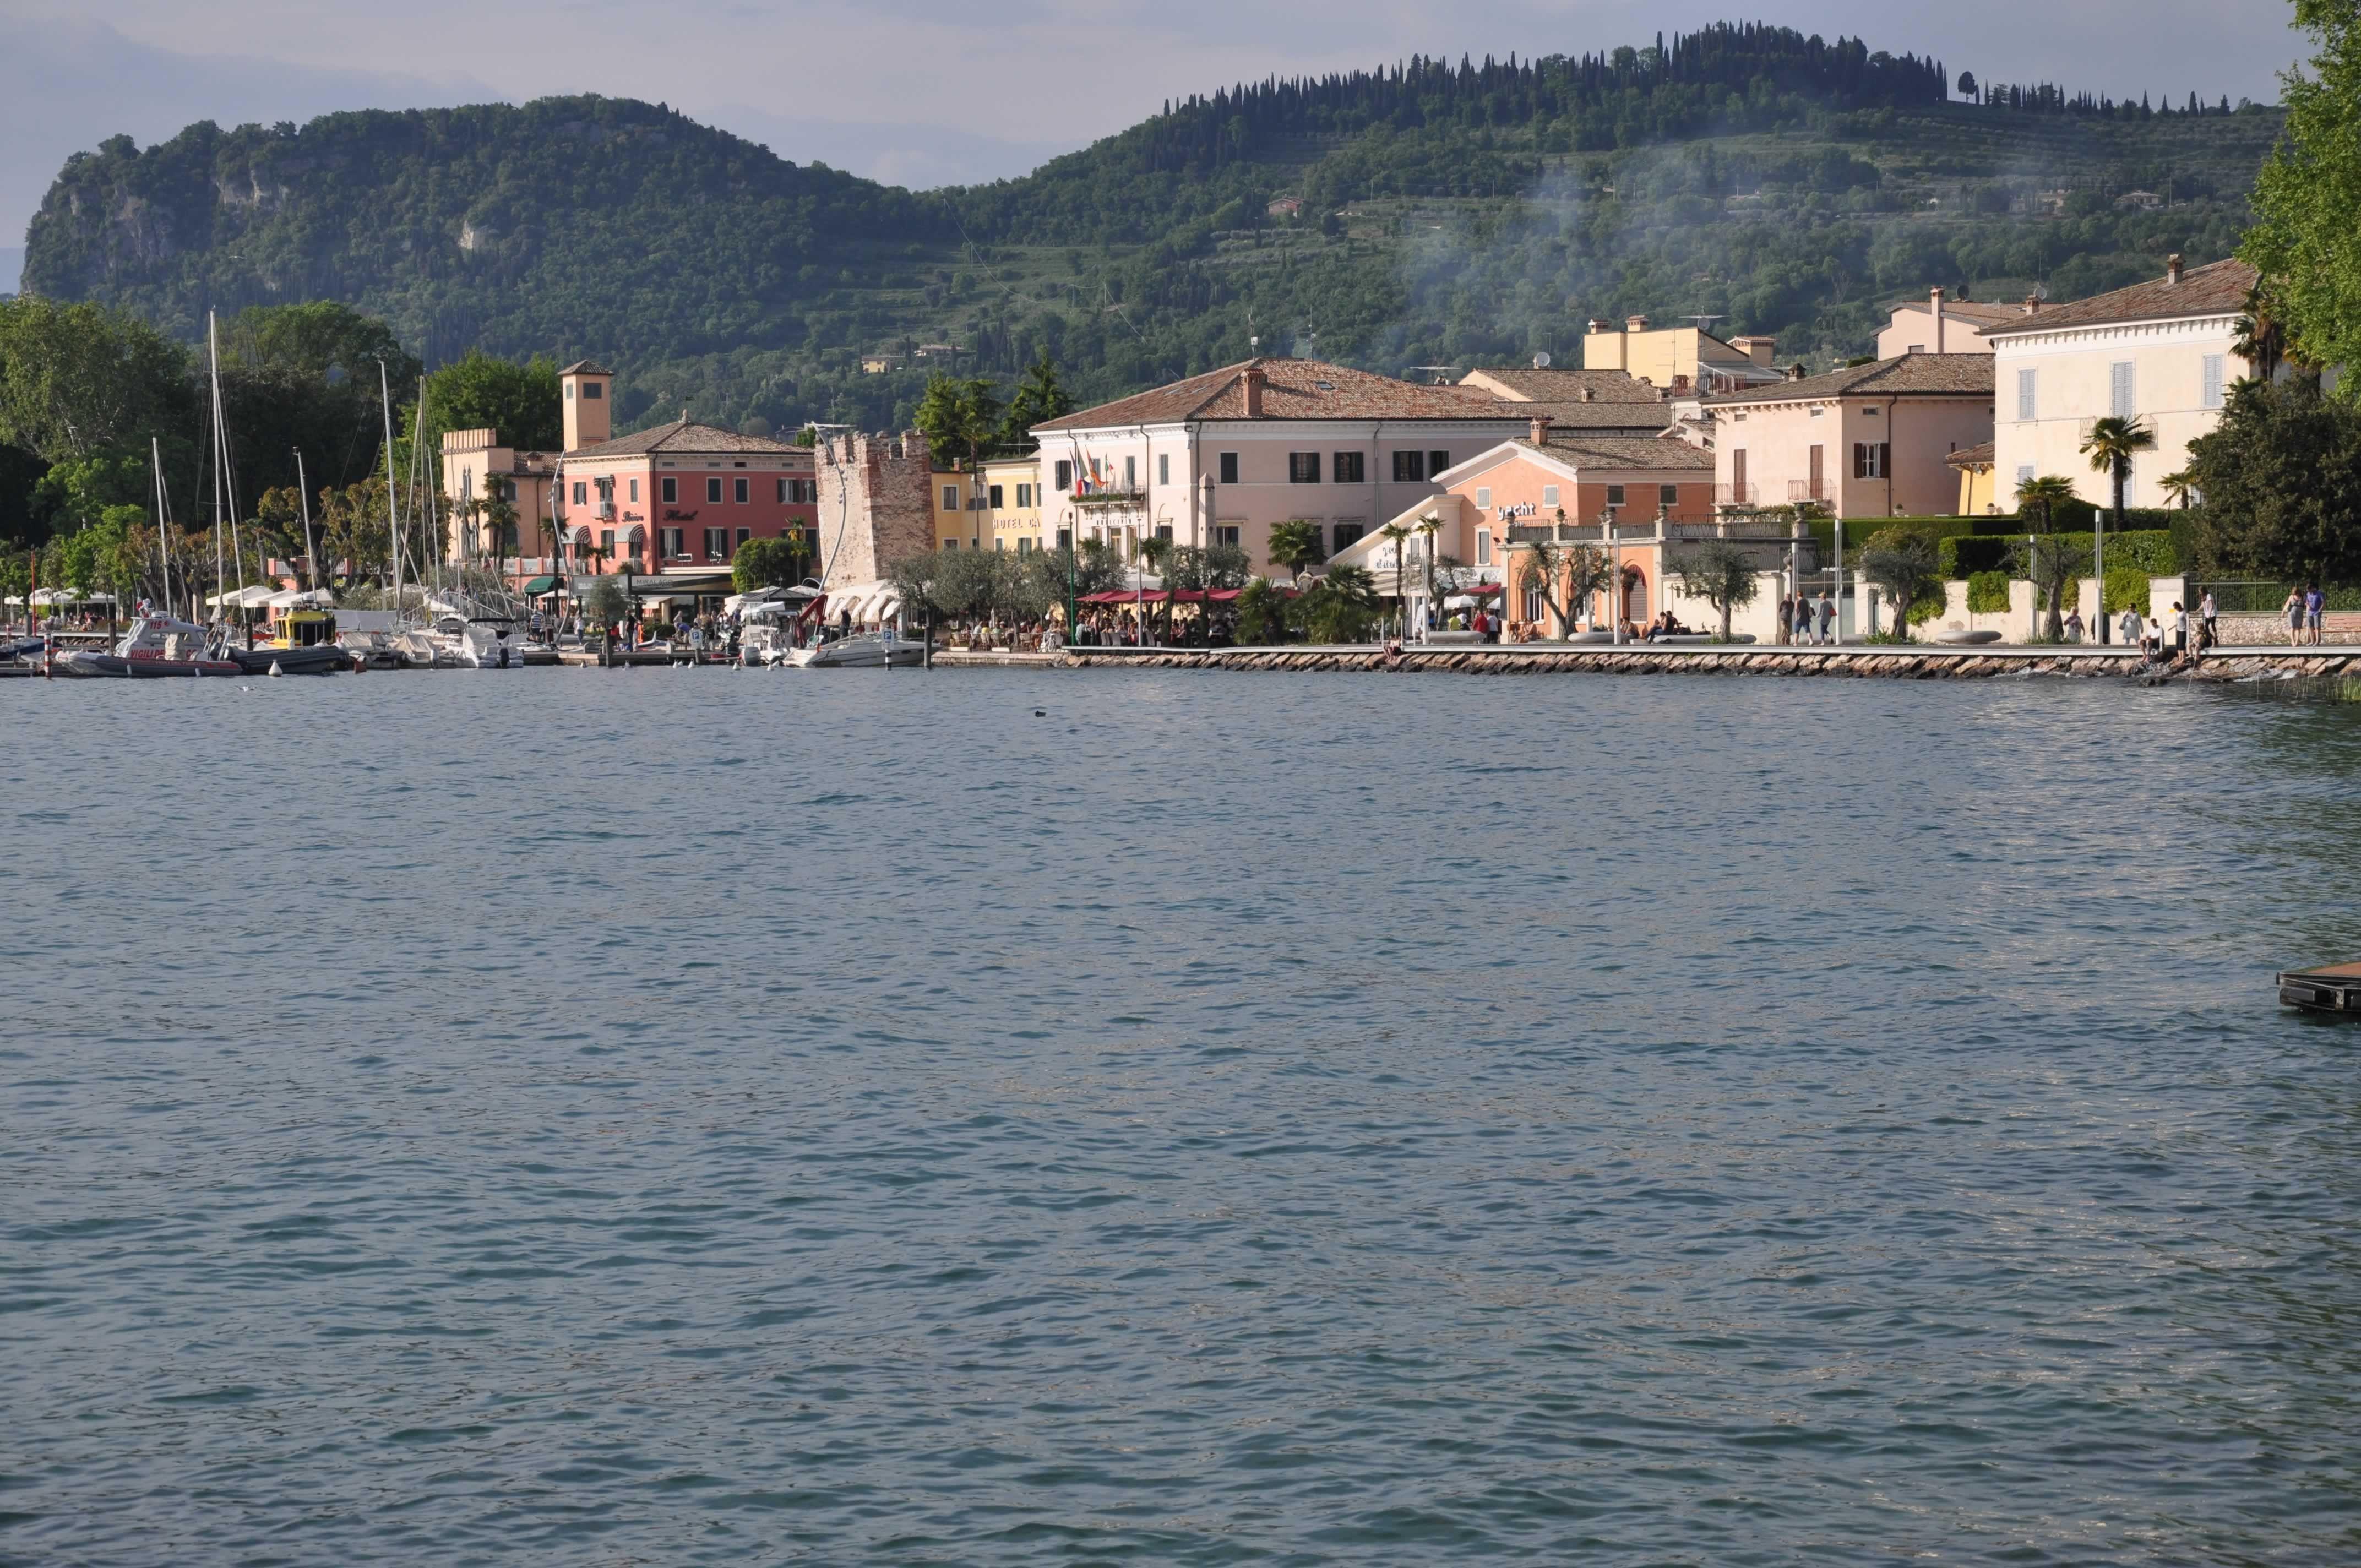 #Bardolino #lake #Italy #Garda #summer #travel #Italy #mountains #harbour